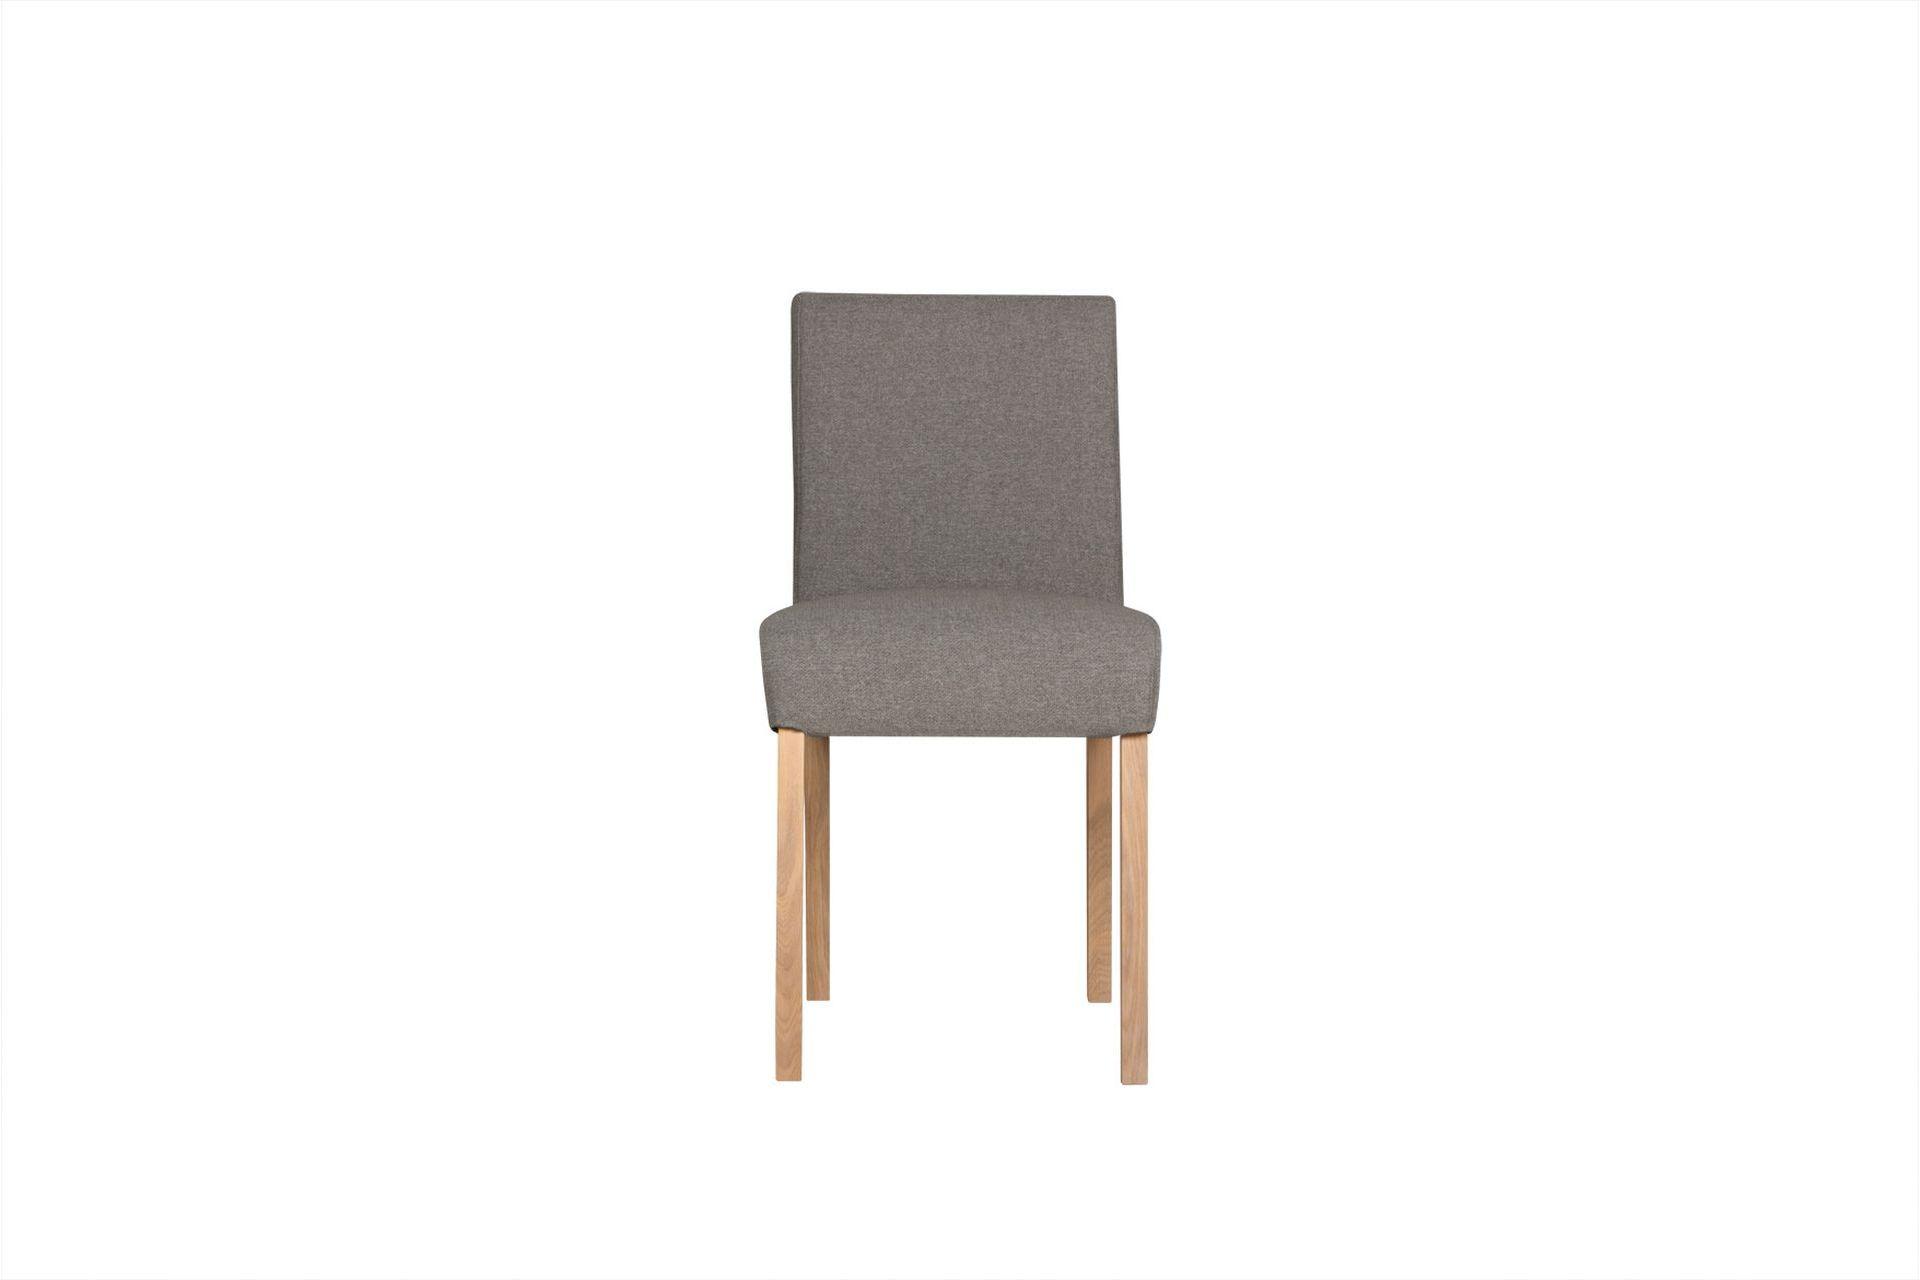 Кухонный стул Sits 15447055 от thefurnish